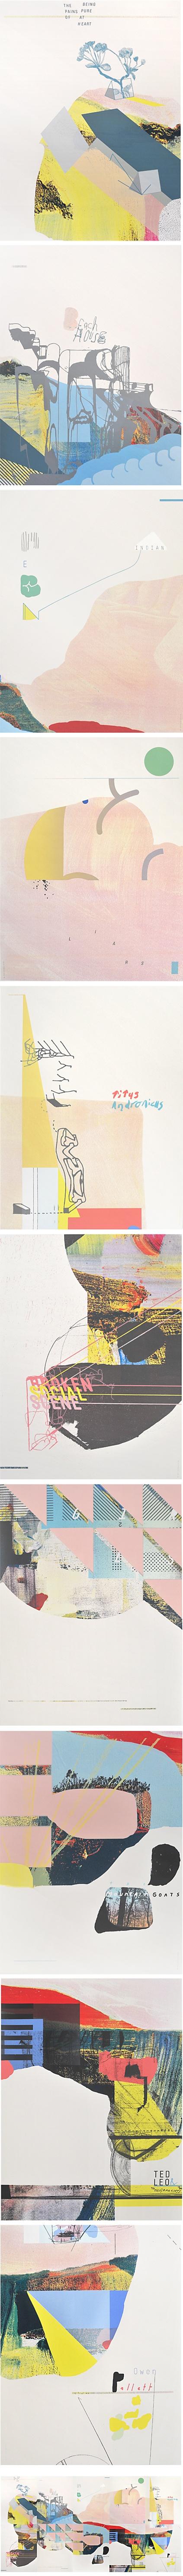 Sonnenzimmer.   Sonnenzimmer is the Chicago-based studio of Nick Butcher and Nadine Nakanishi.